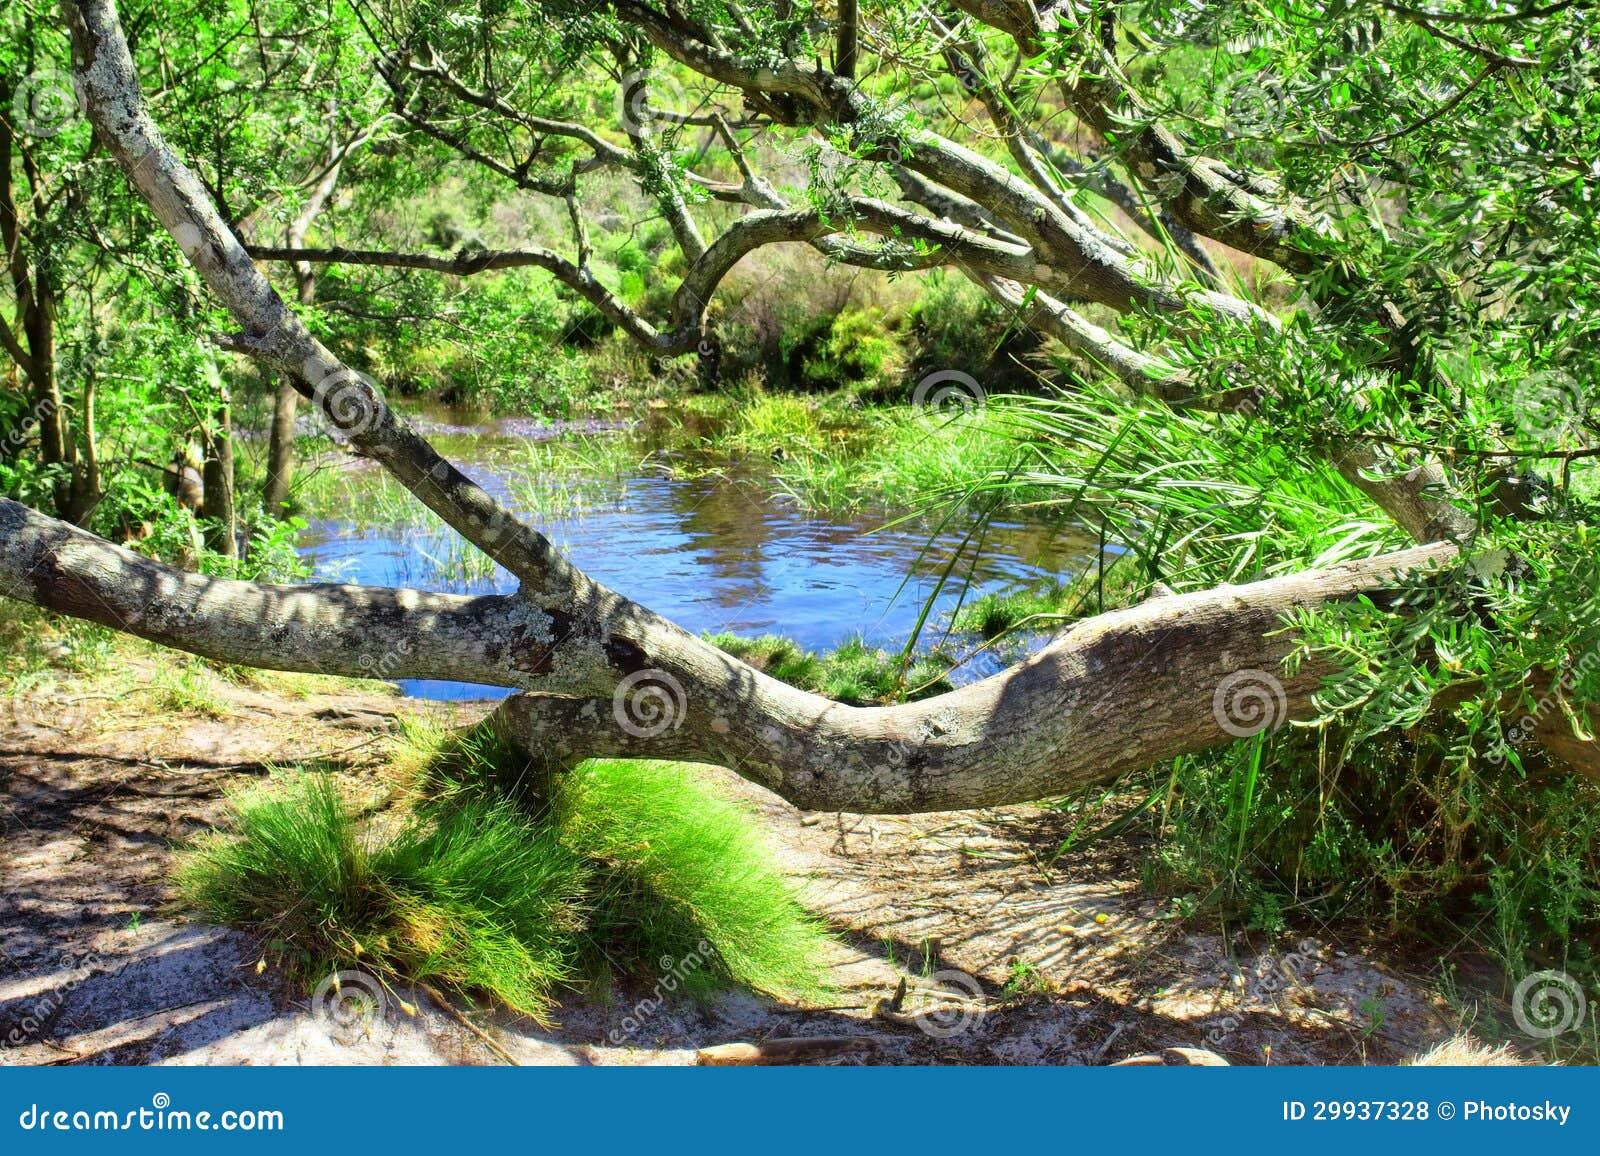 Uiterst kleine vijver in inheems bos royalty vrije stock for Kleine tuinvijver